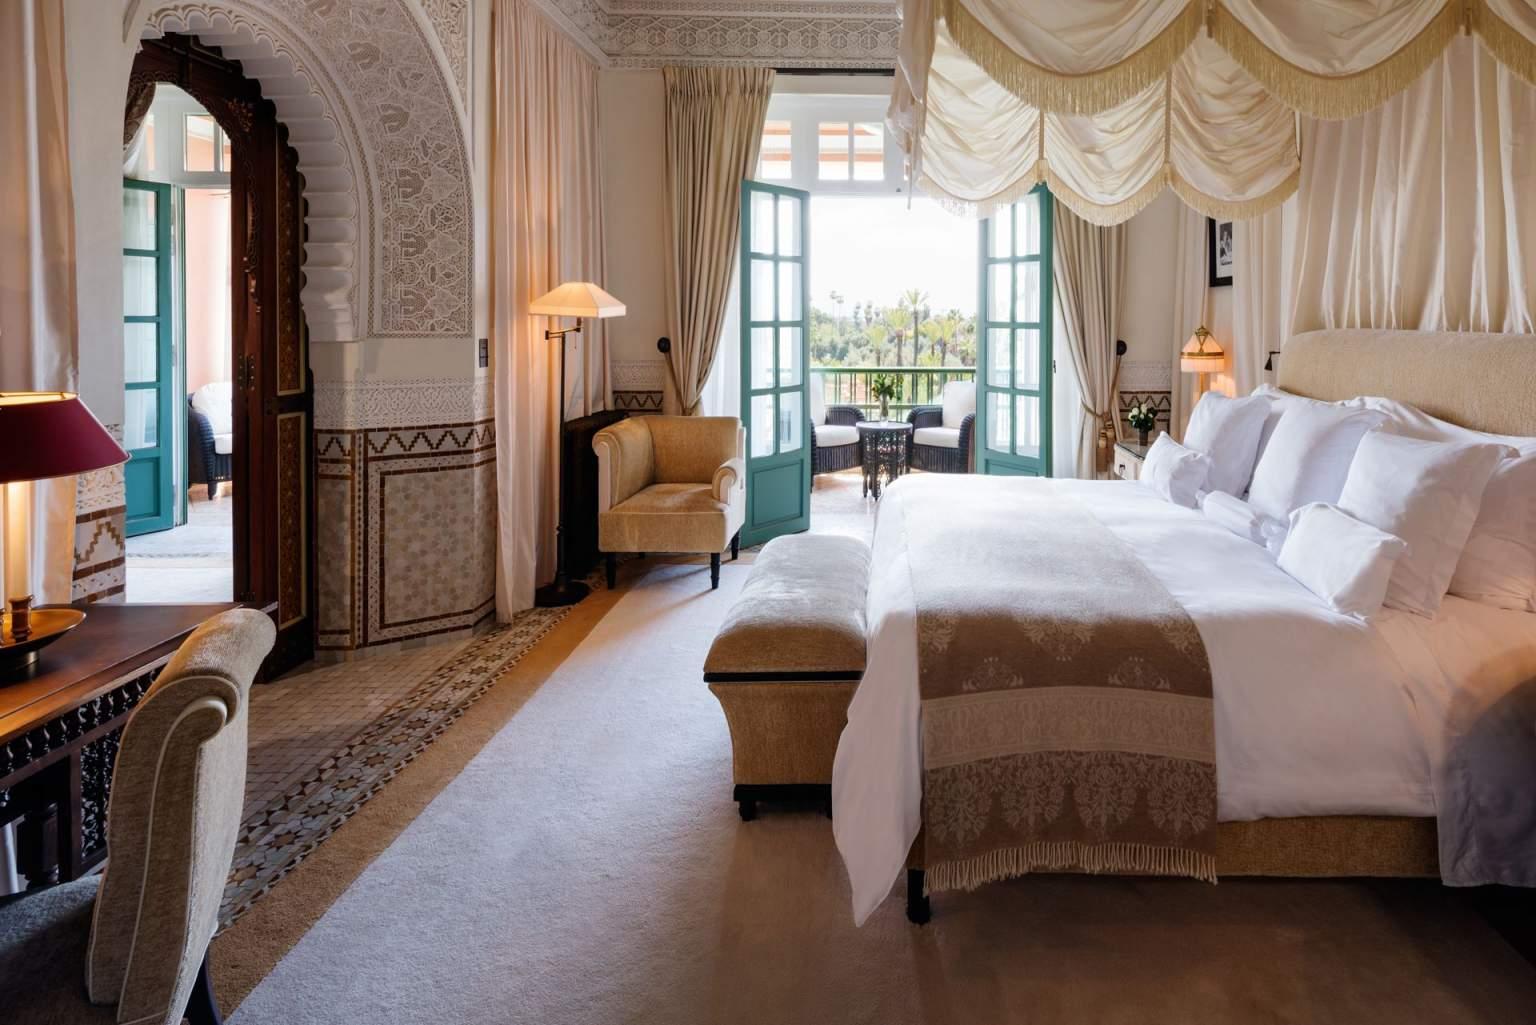 La-Mamounia-bedroom-suite.jpg